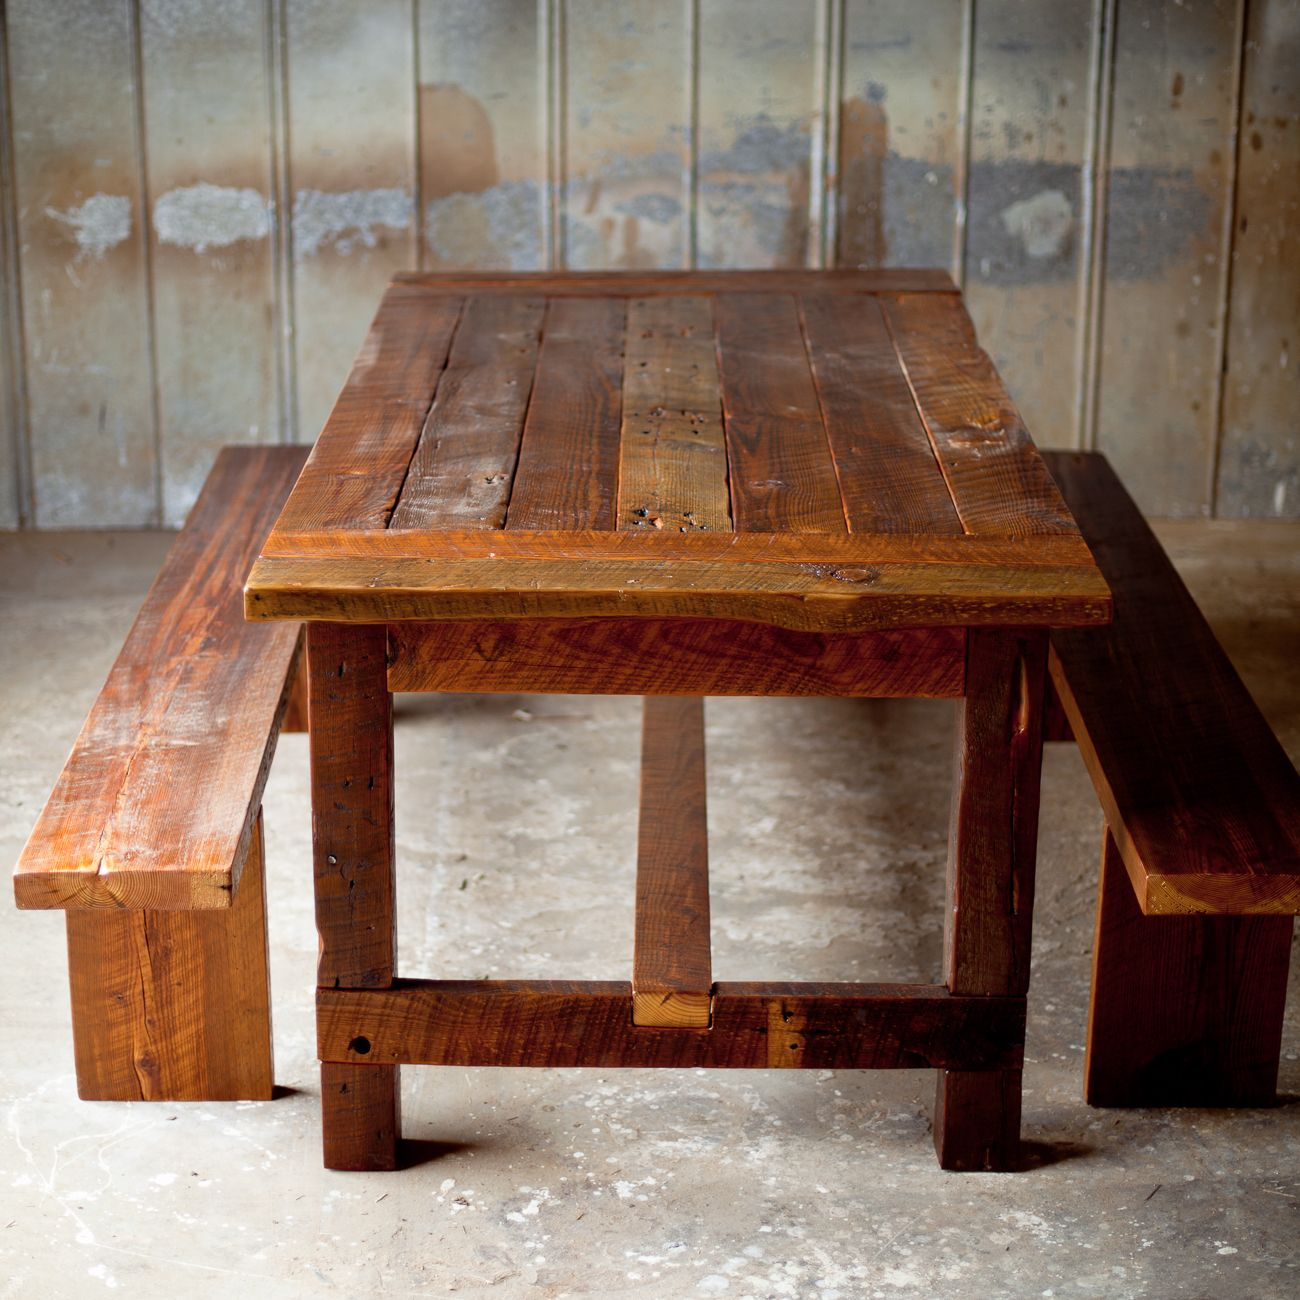 ca568eaf18a2 reclaimed-wood-farm-table-rustic-sons-of-sawdust-wood-working -Athens-Georgia-1